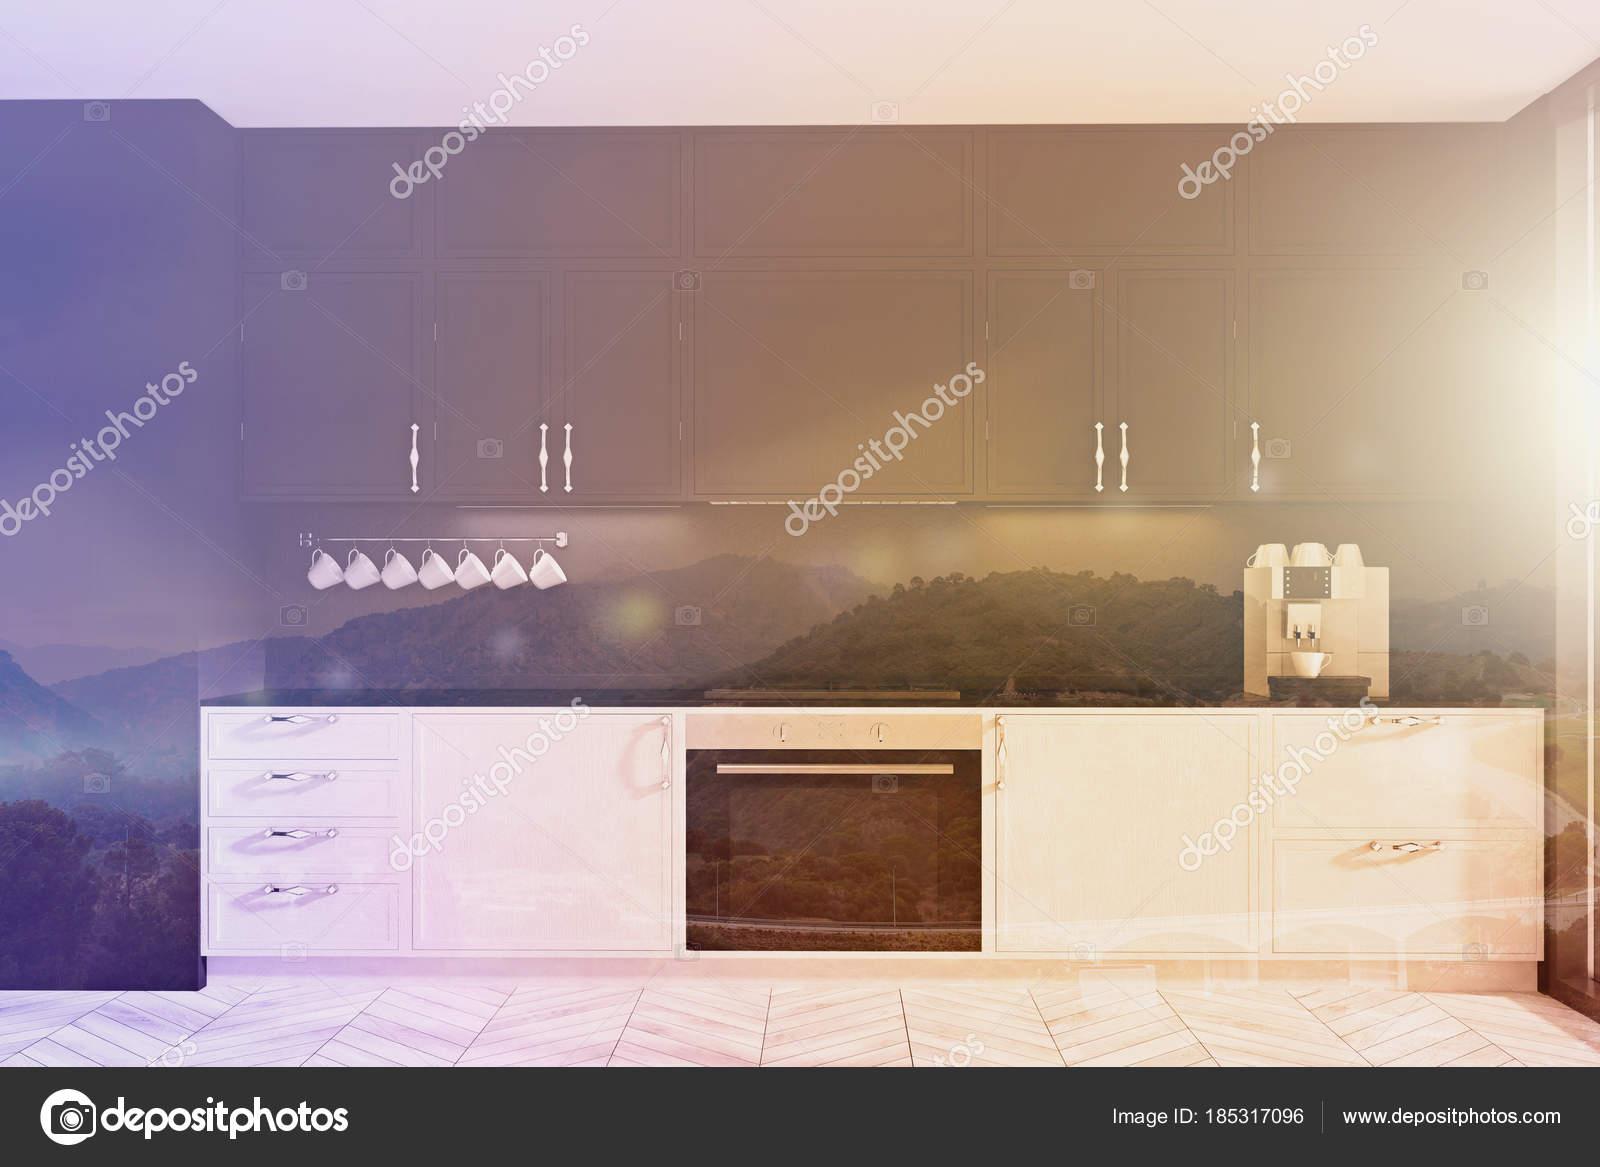 Zwarte Keuken Ideeen : Witte en zwarte originele keuken idee toned u2014 stockfoto